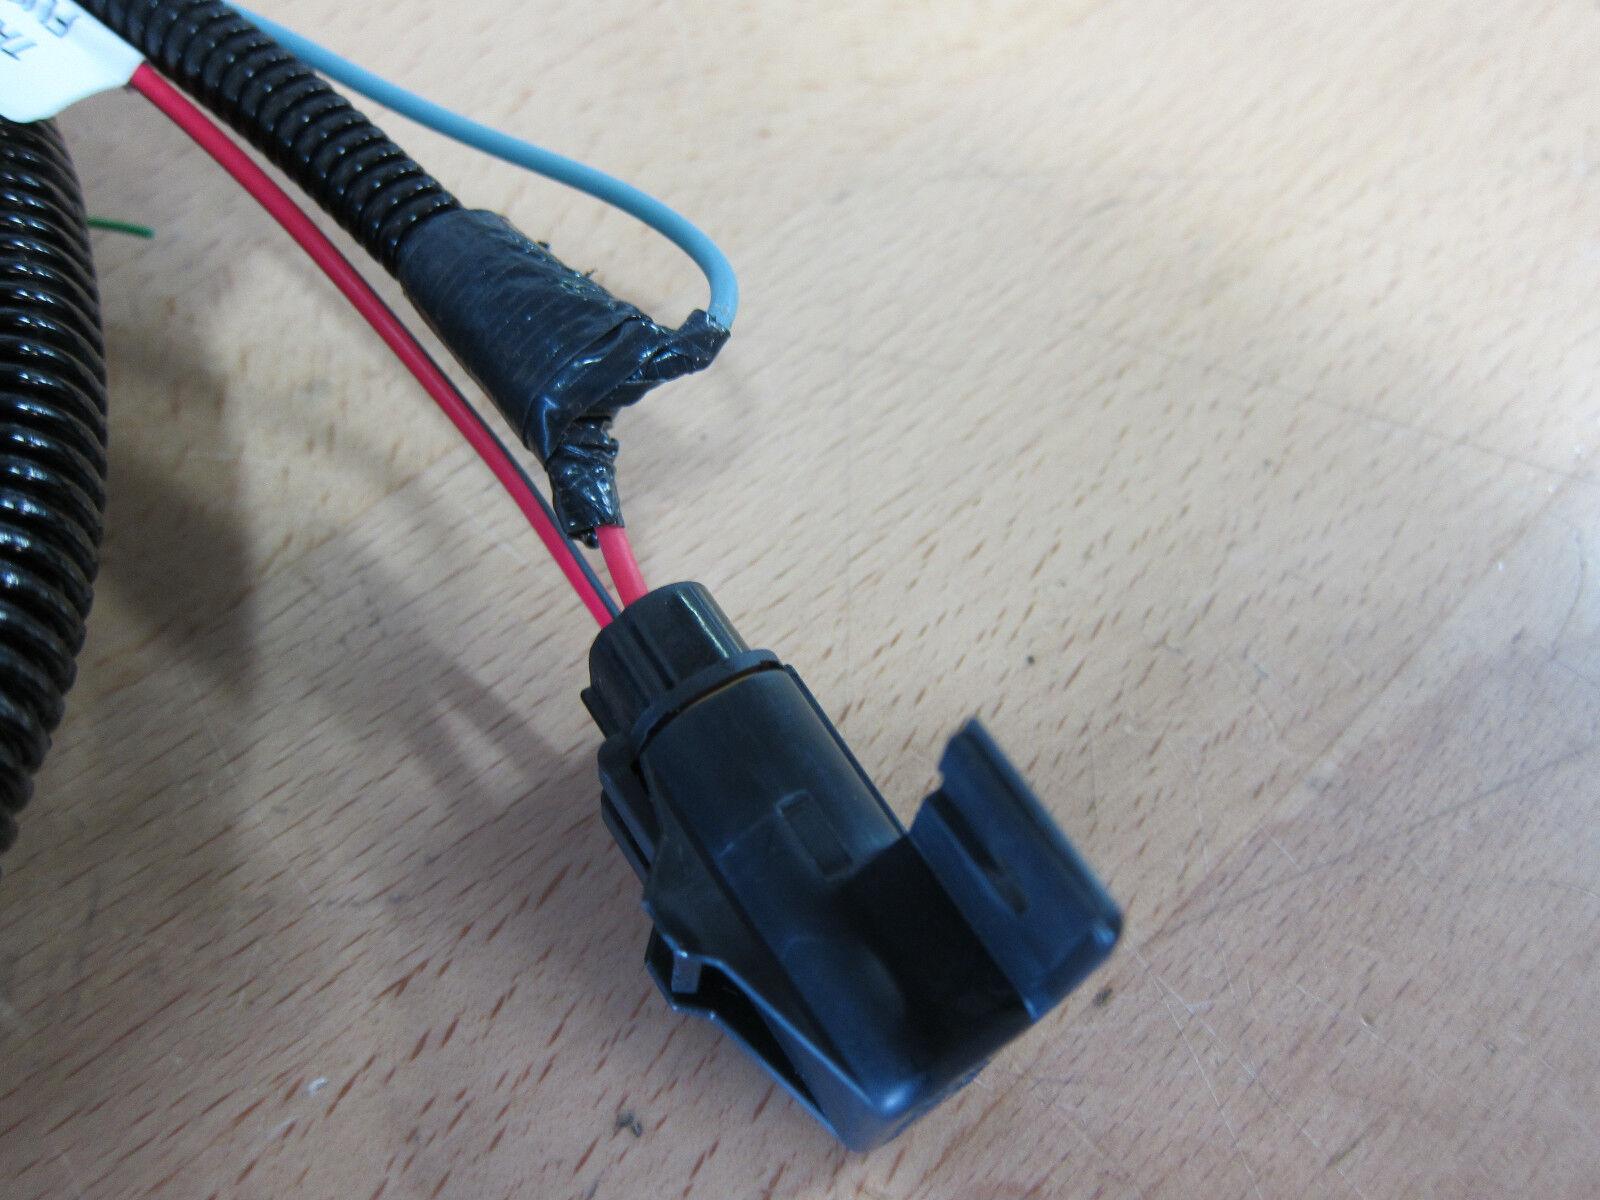 2013 Kia Sportage Trailer Wiring Schematic Diagrams Dodge Journey Factory Harness Electrical Work Black